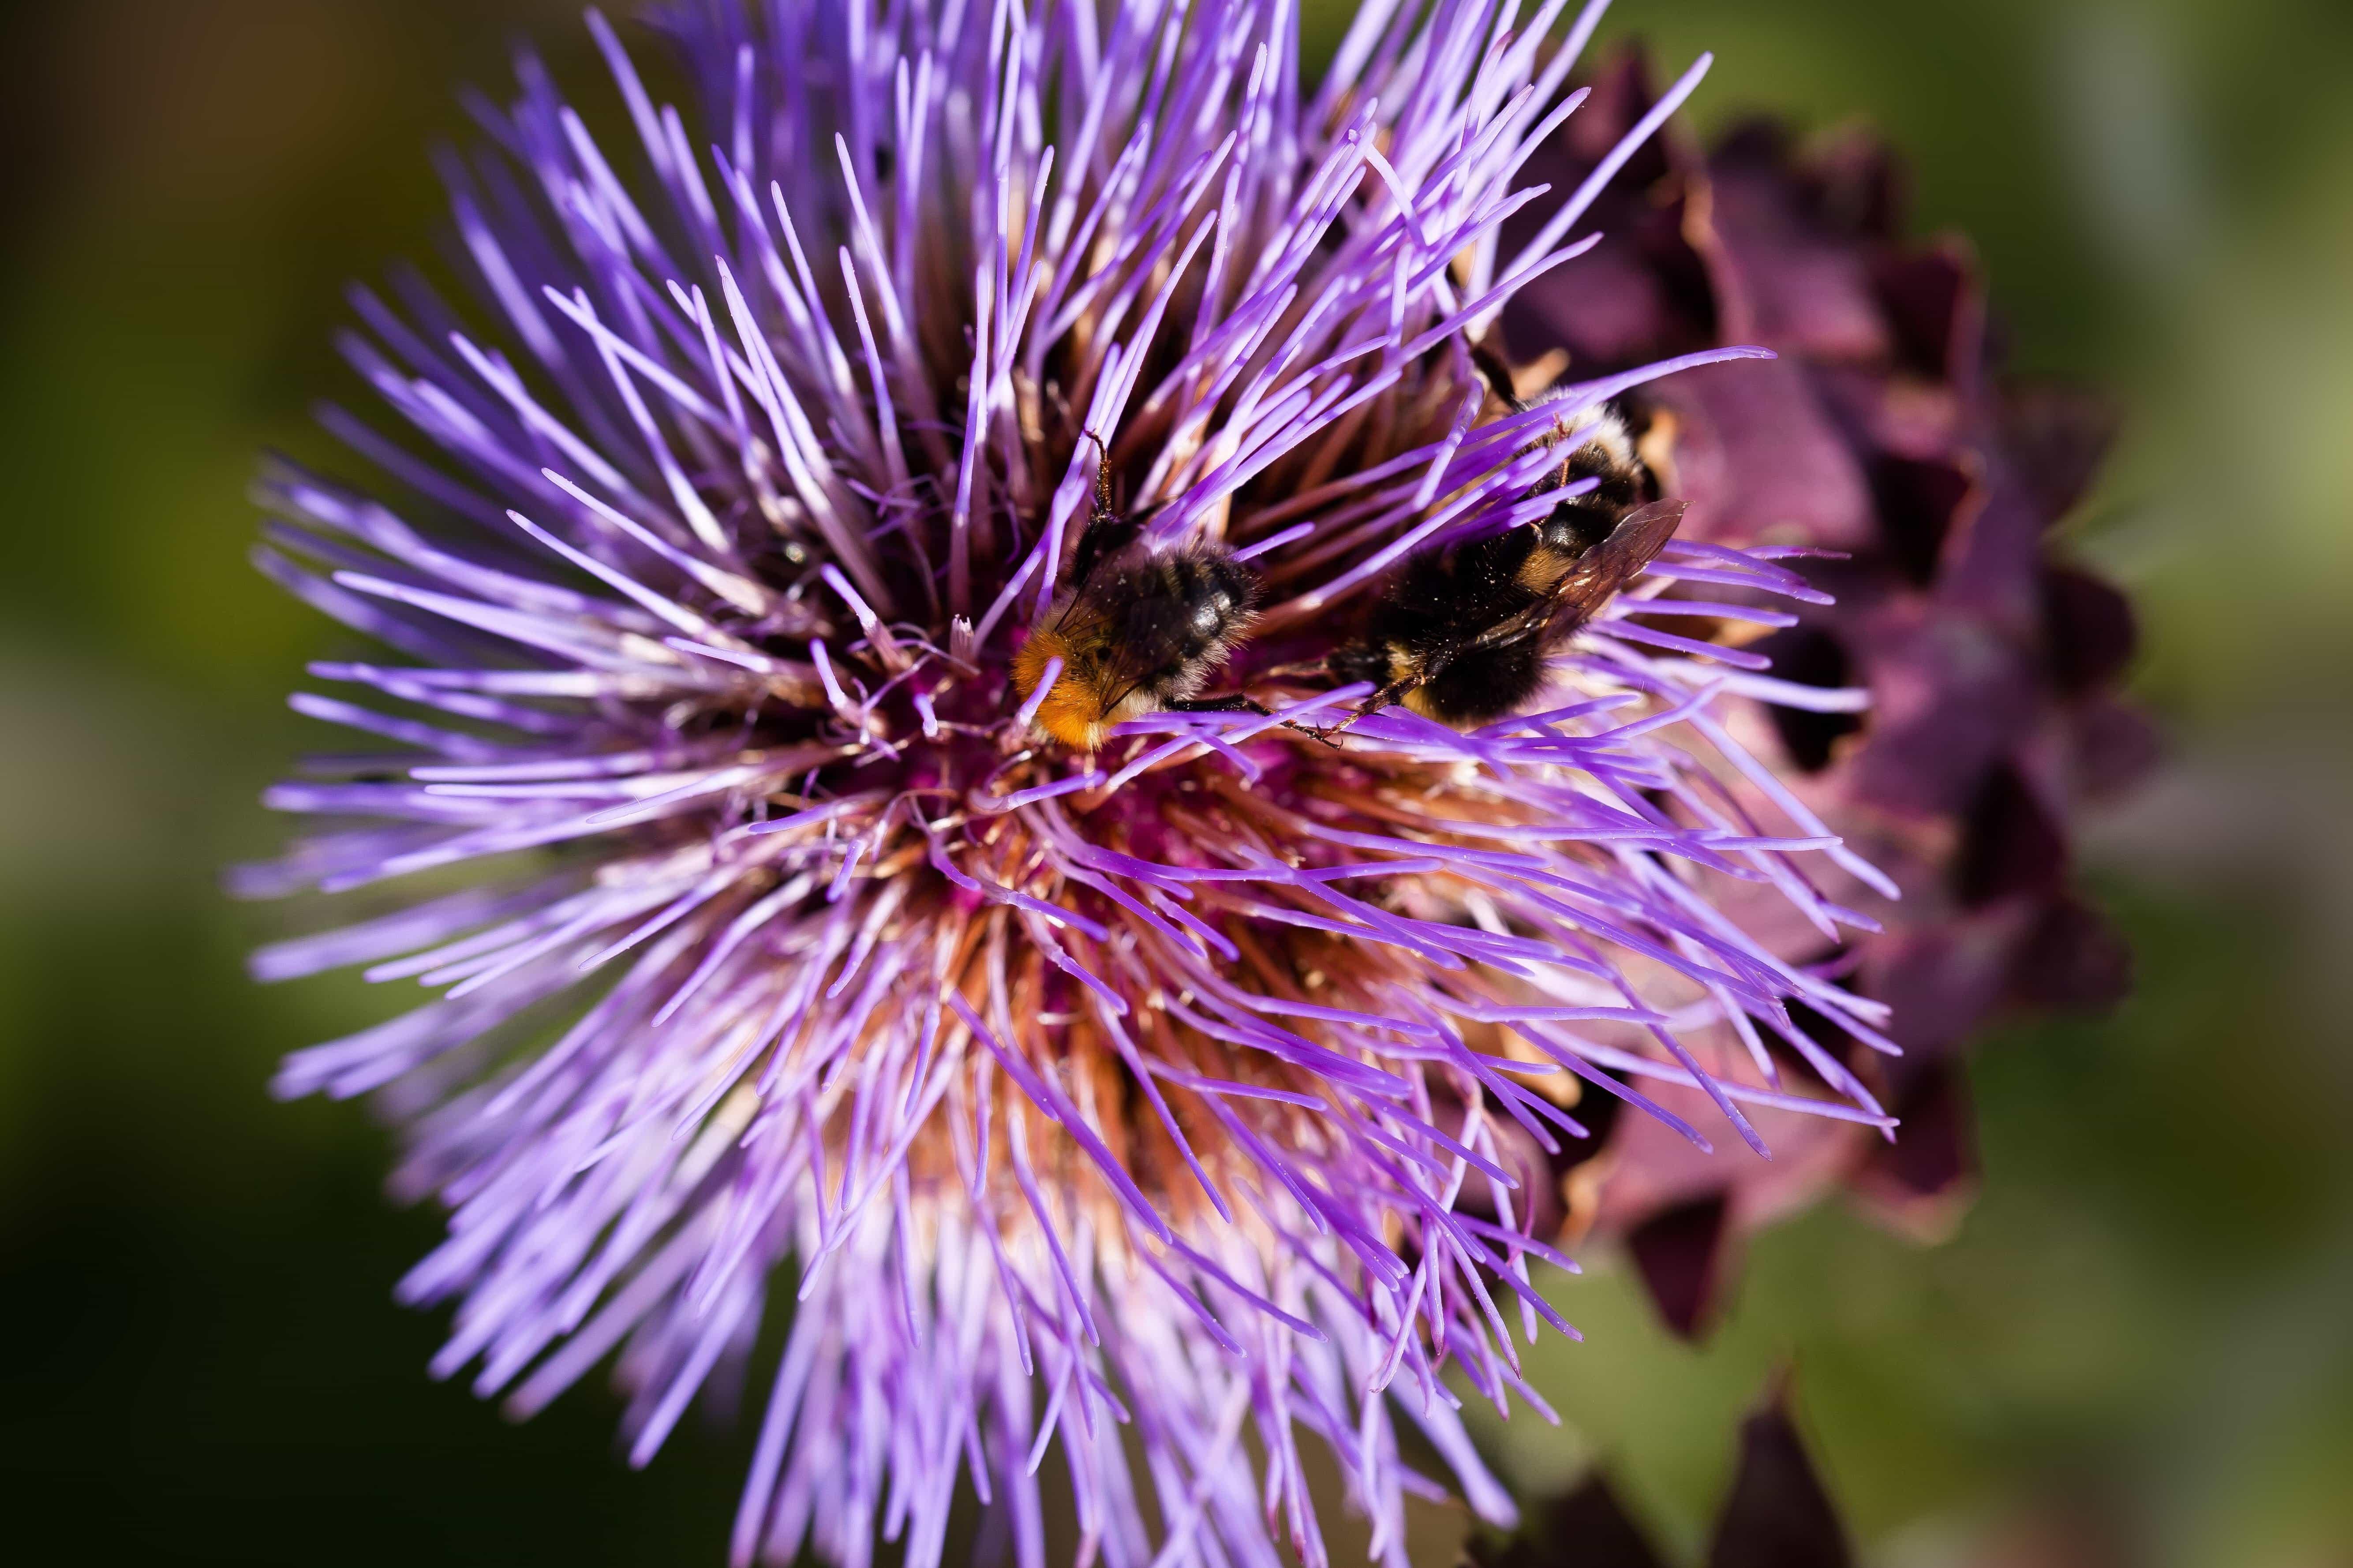 bunga ungu, alam, Taman, siang hari, hari, ramuan, tanaman